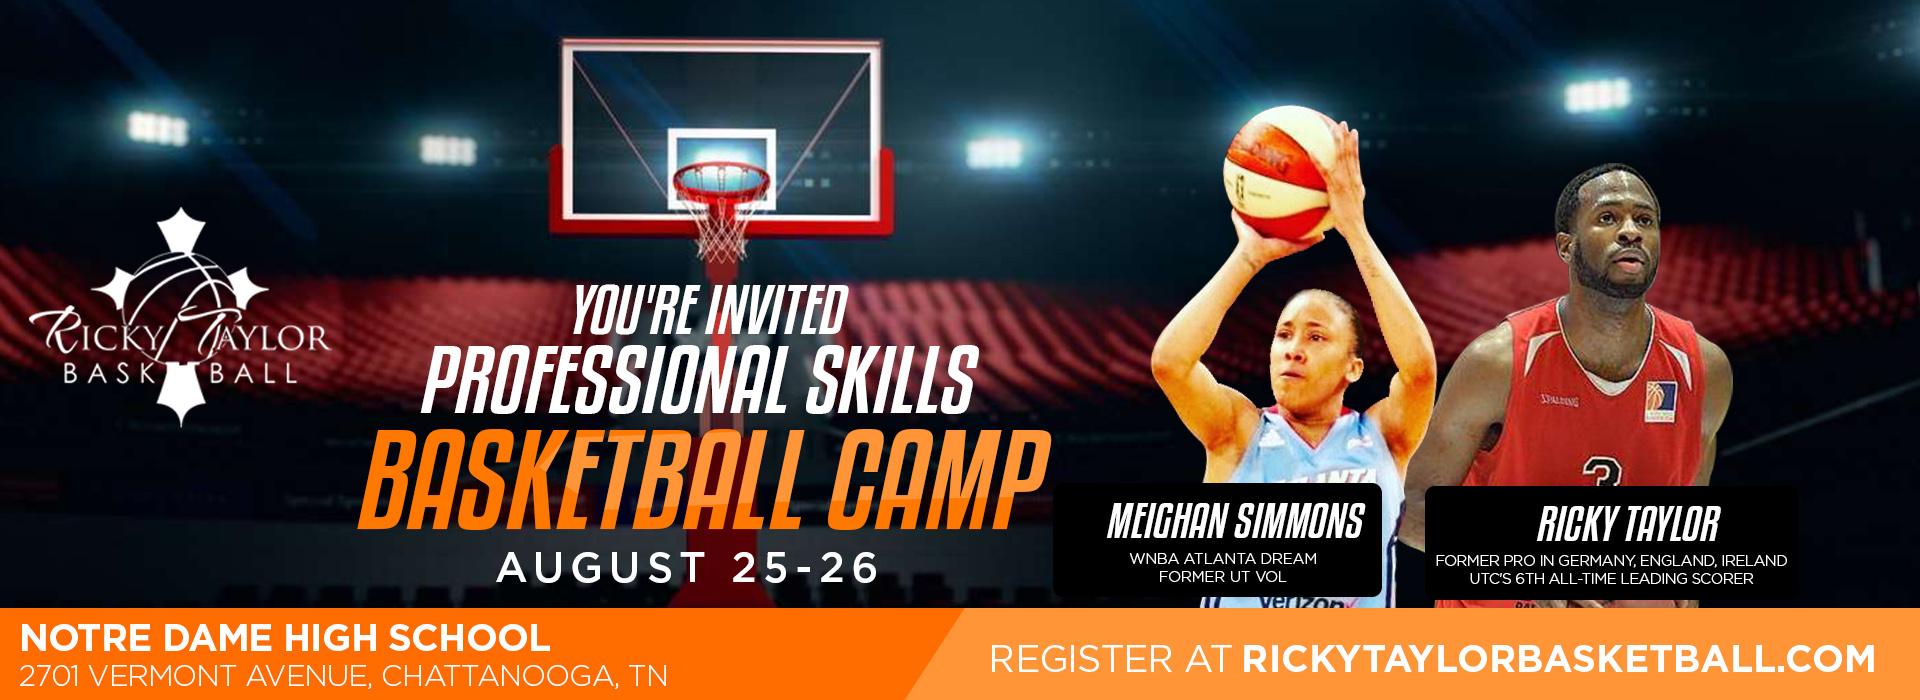 Pro-Skills-Basketball-Camp-Banner